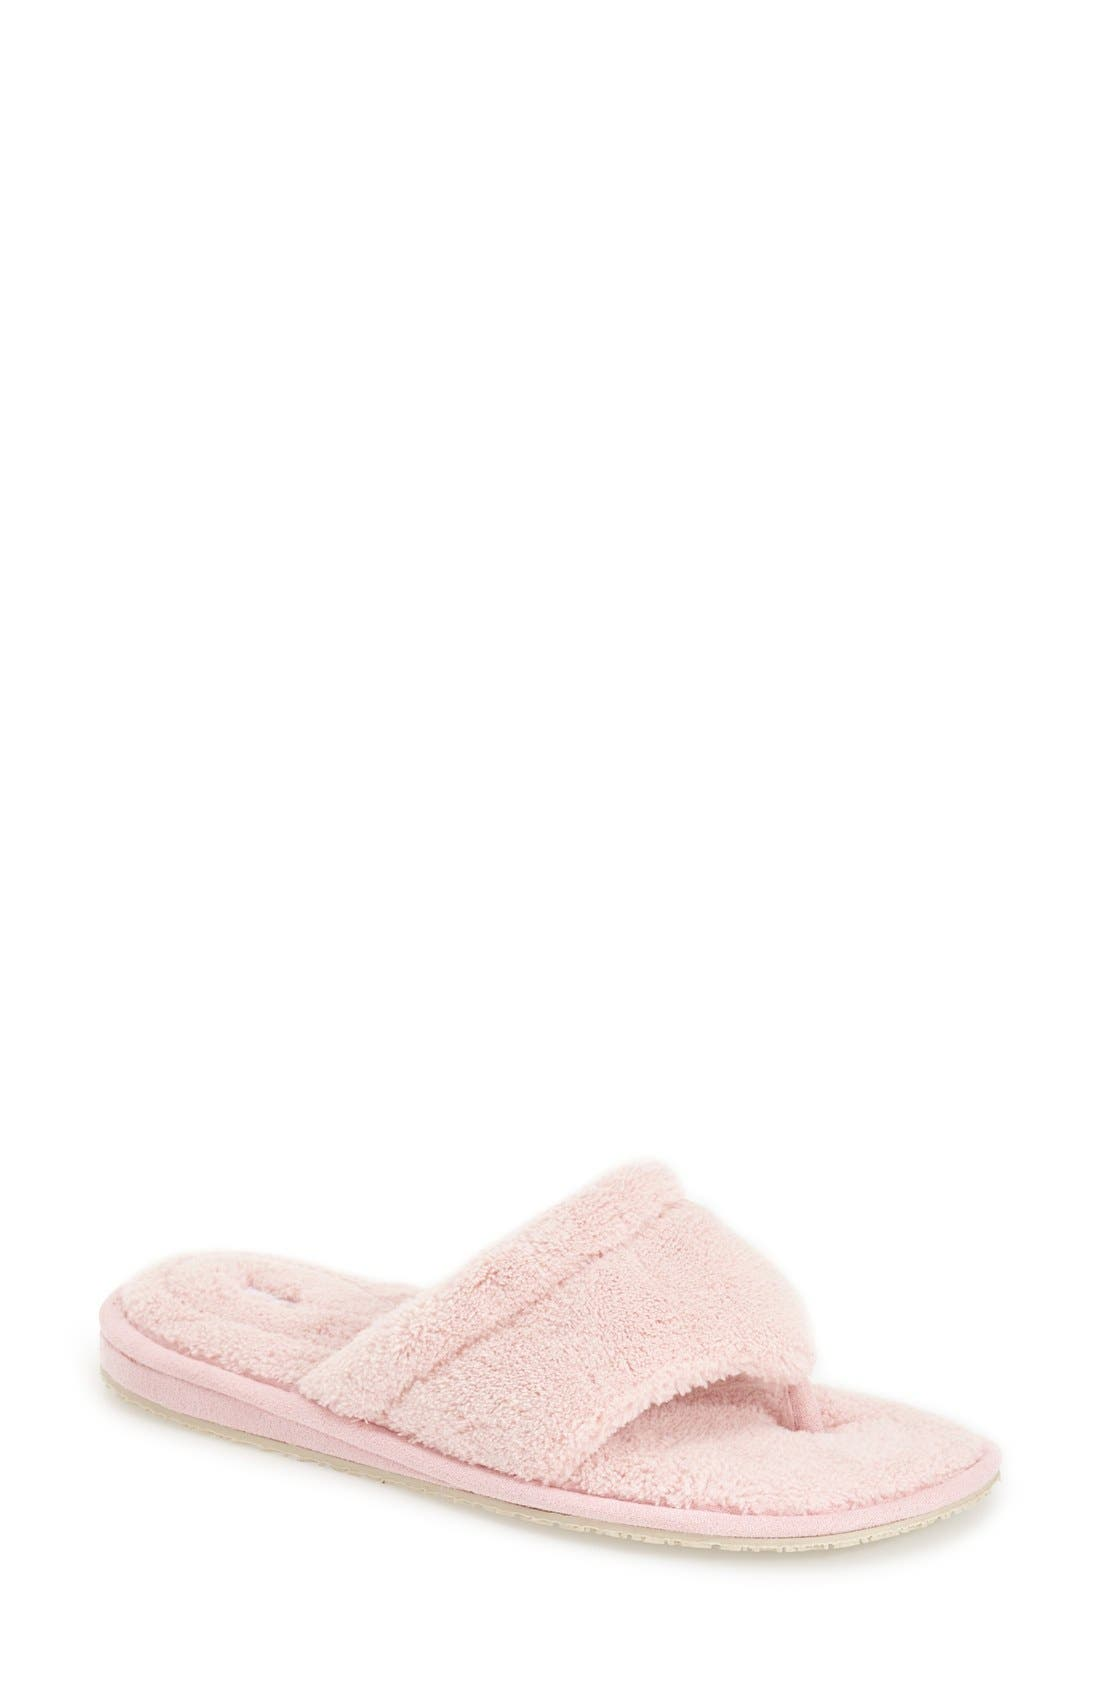 'Splash' Slipper,                         Main,                         color, Pink